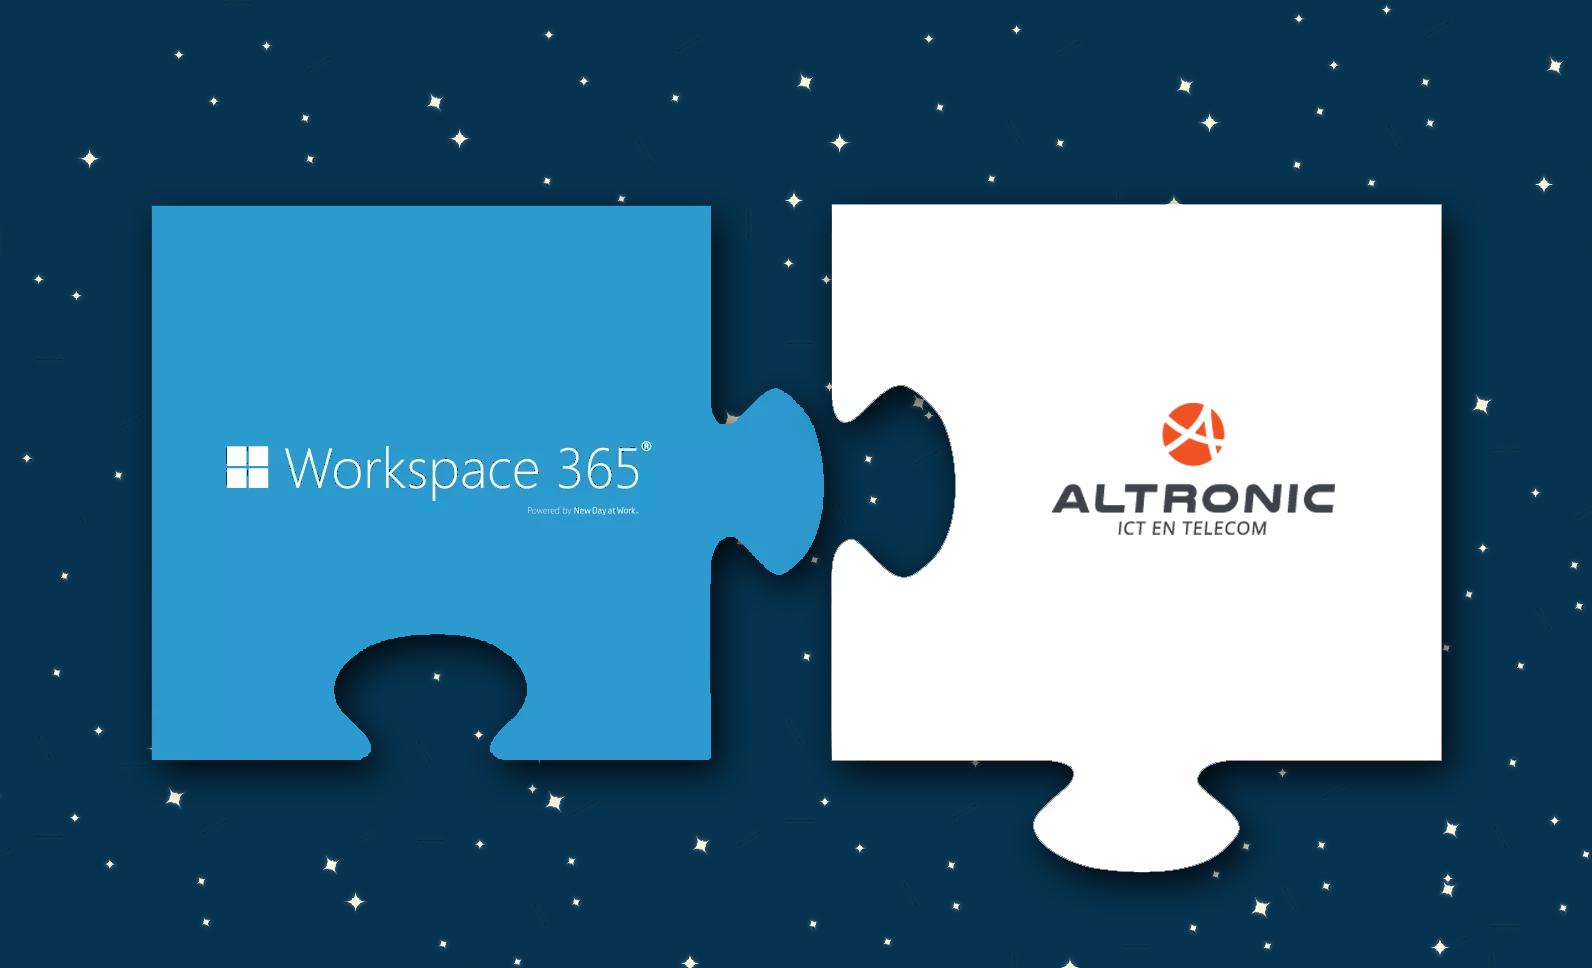 Altronic Workspace 365 partner